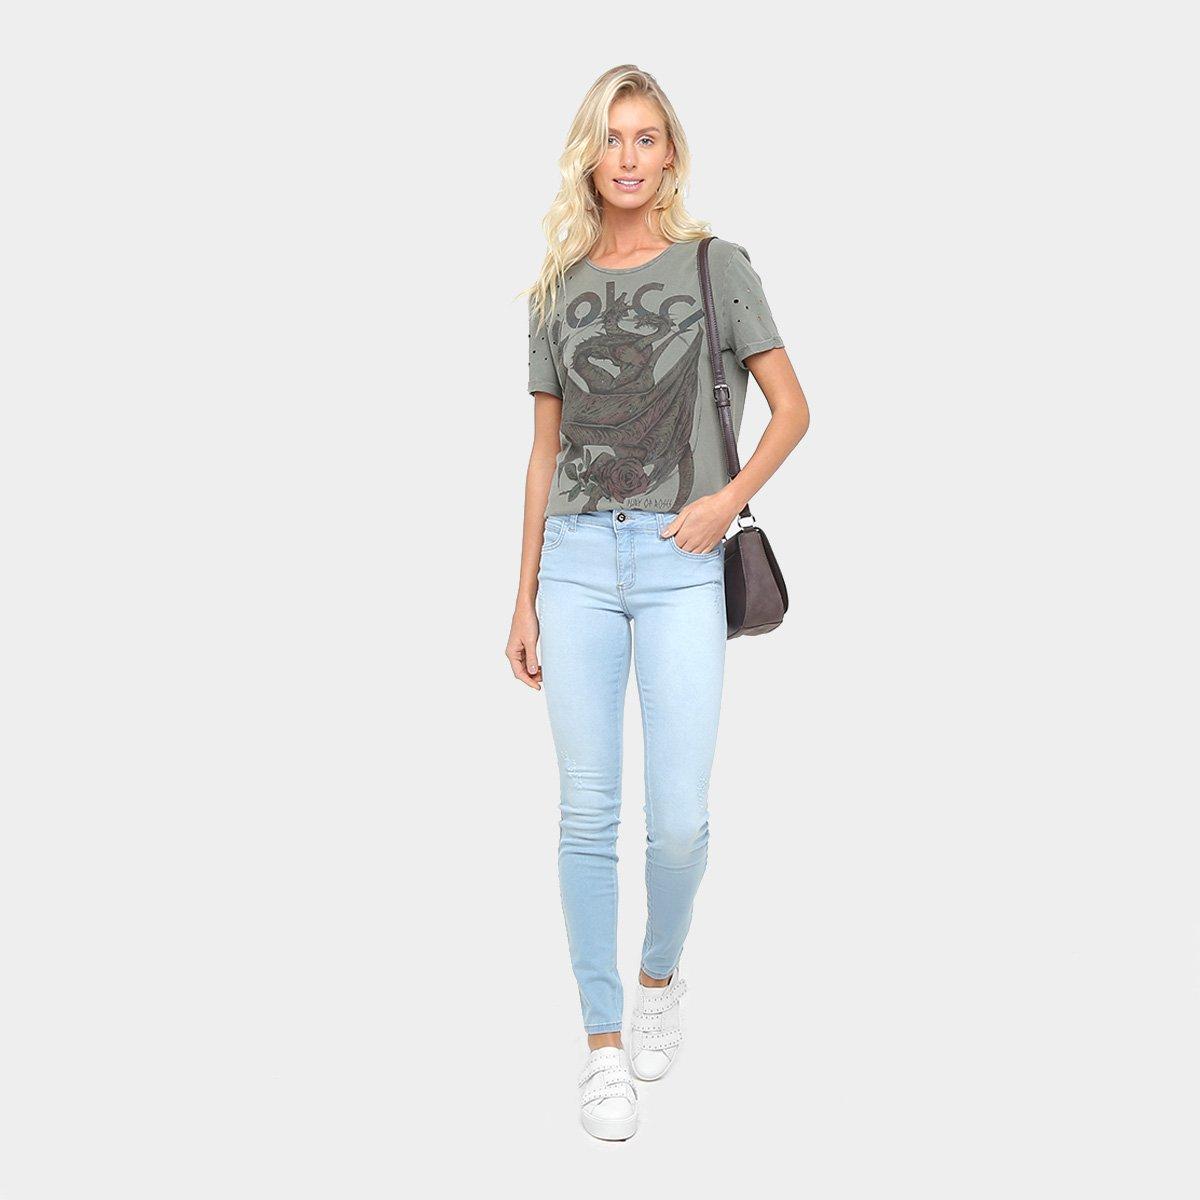 Camiseta Colcci Estonada Silk Furos Feminina - Compre Agora   Zattini 681a35527e